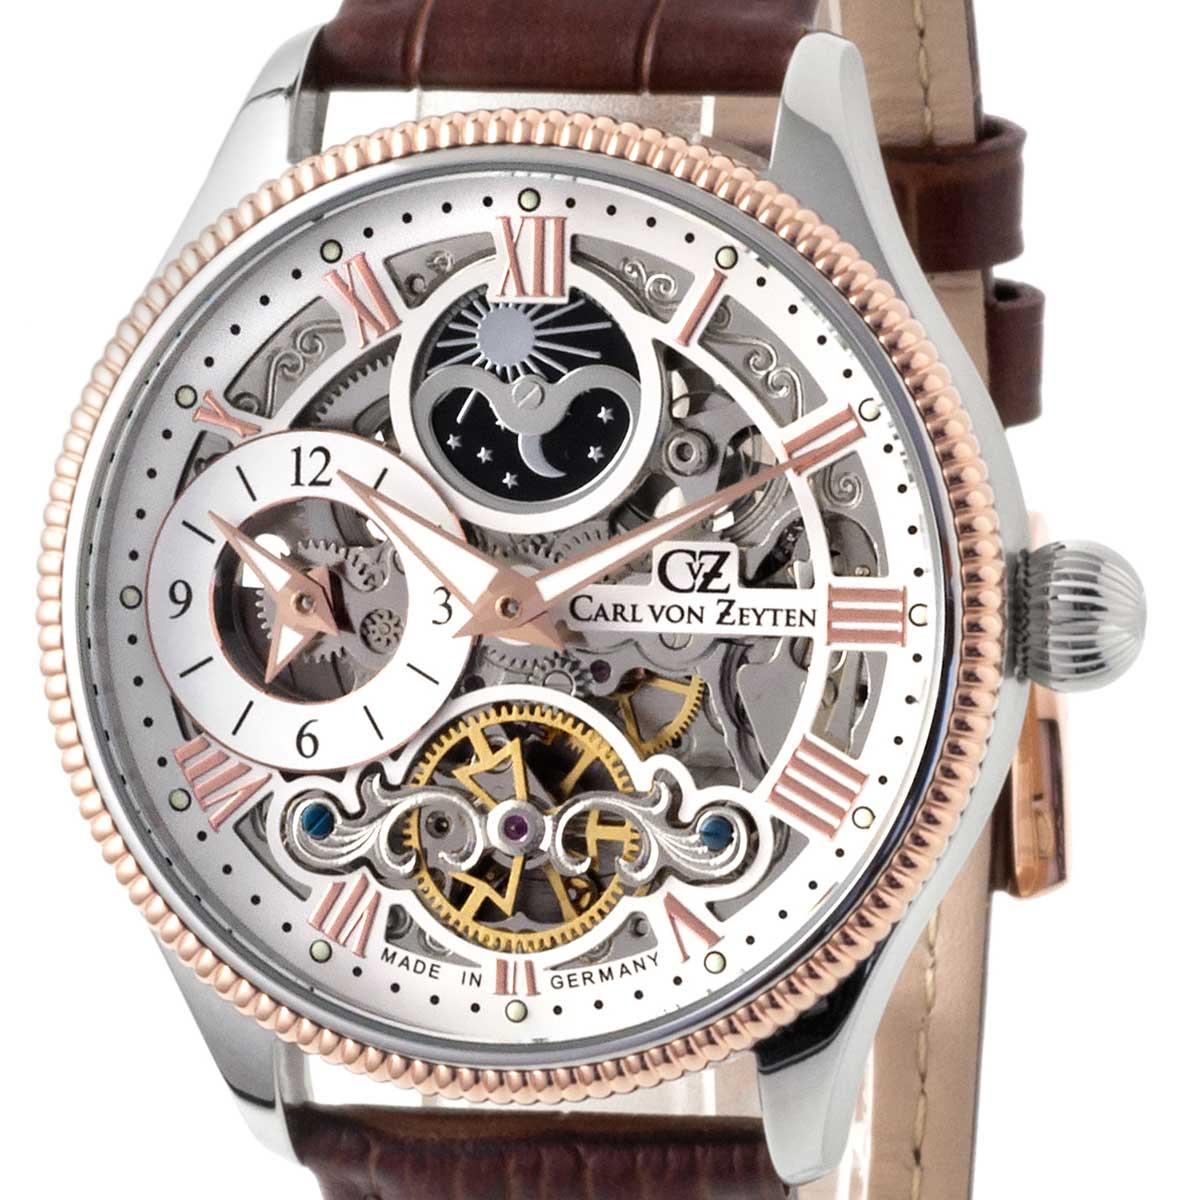 Carl von Zeyten カール・フォン・ツォイテン 自動巻き(手巻き機能あり) 腕時計 [CvZ0034RWH] 正規代理店品  デイ&ナイト(サン&ムーン)スケルトン